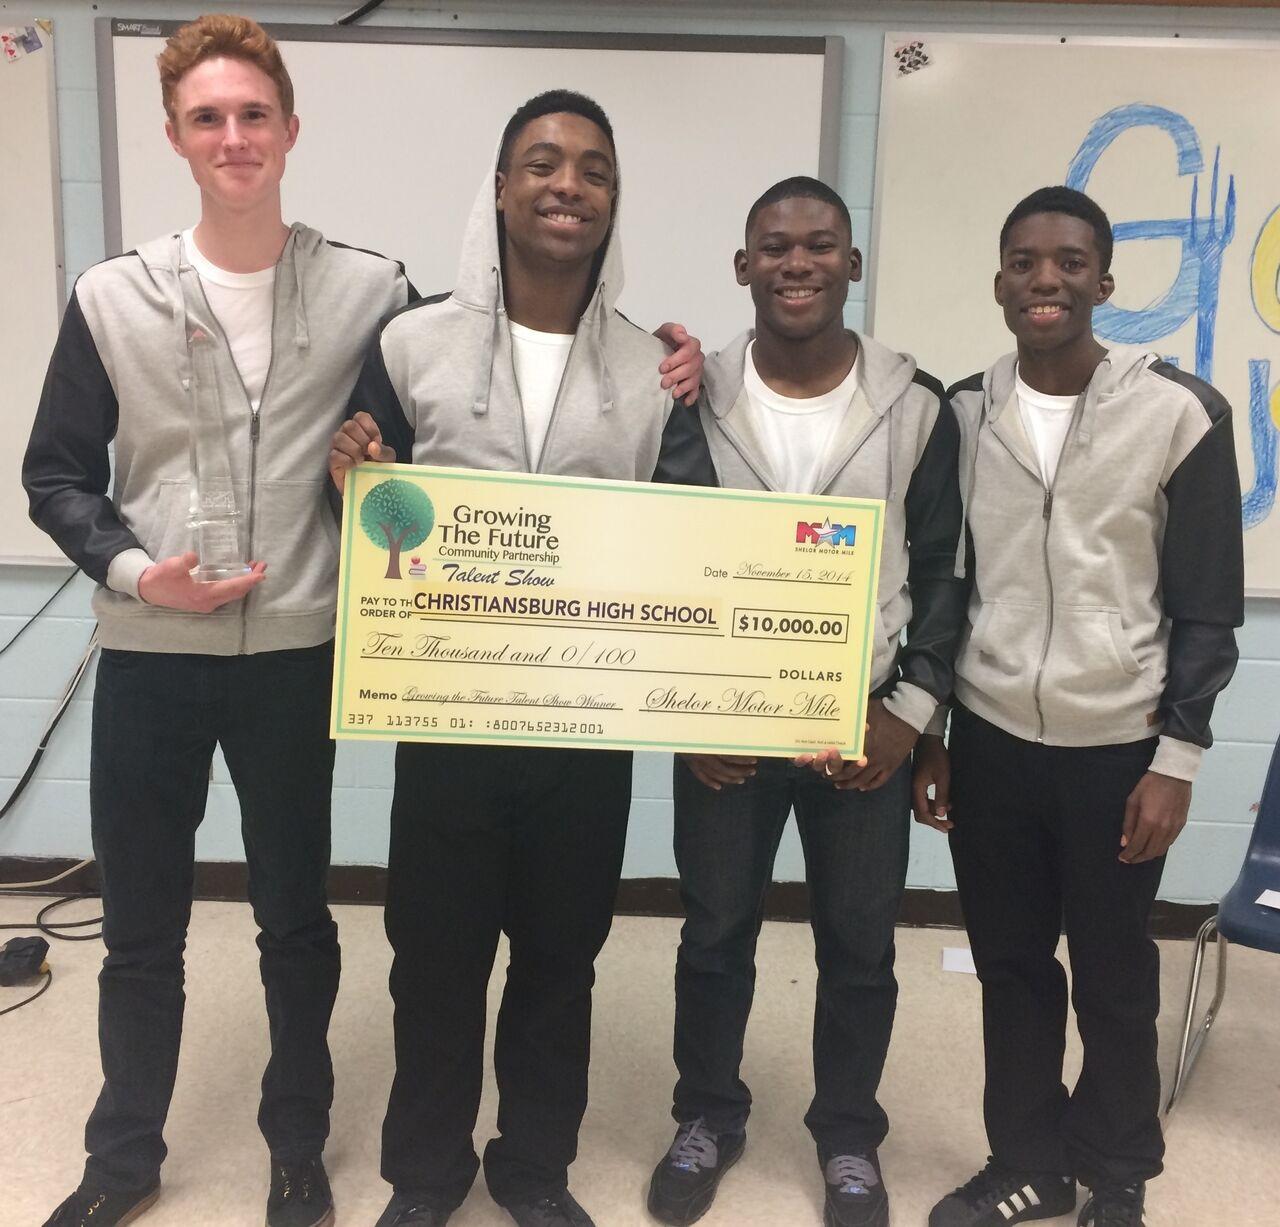 Christiansburg High School's Acapella Group, 2nd Place Winner